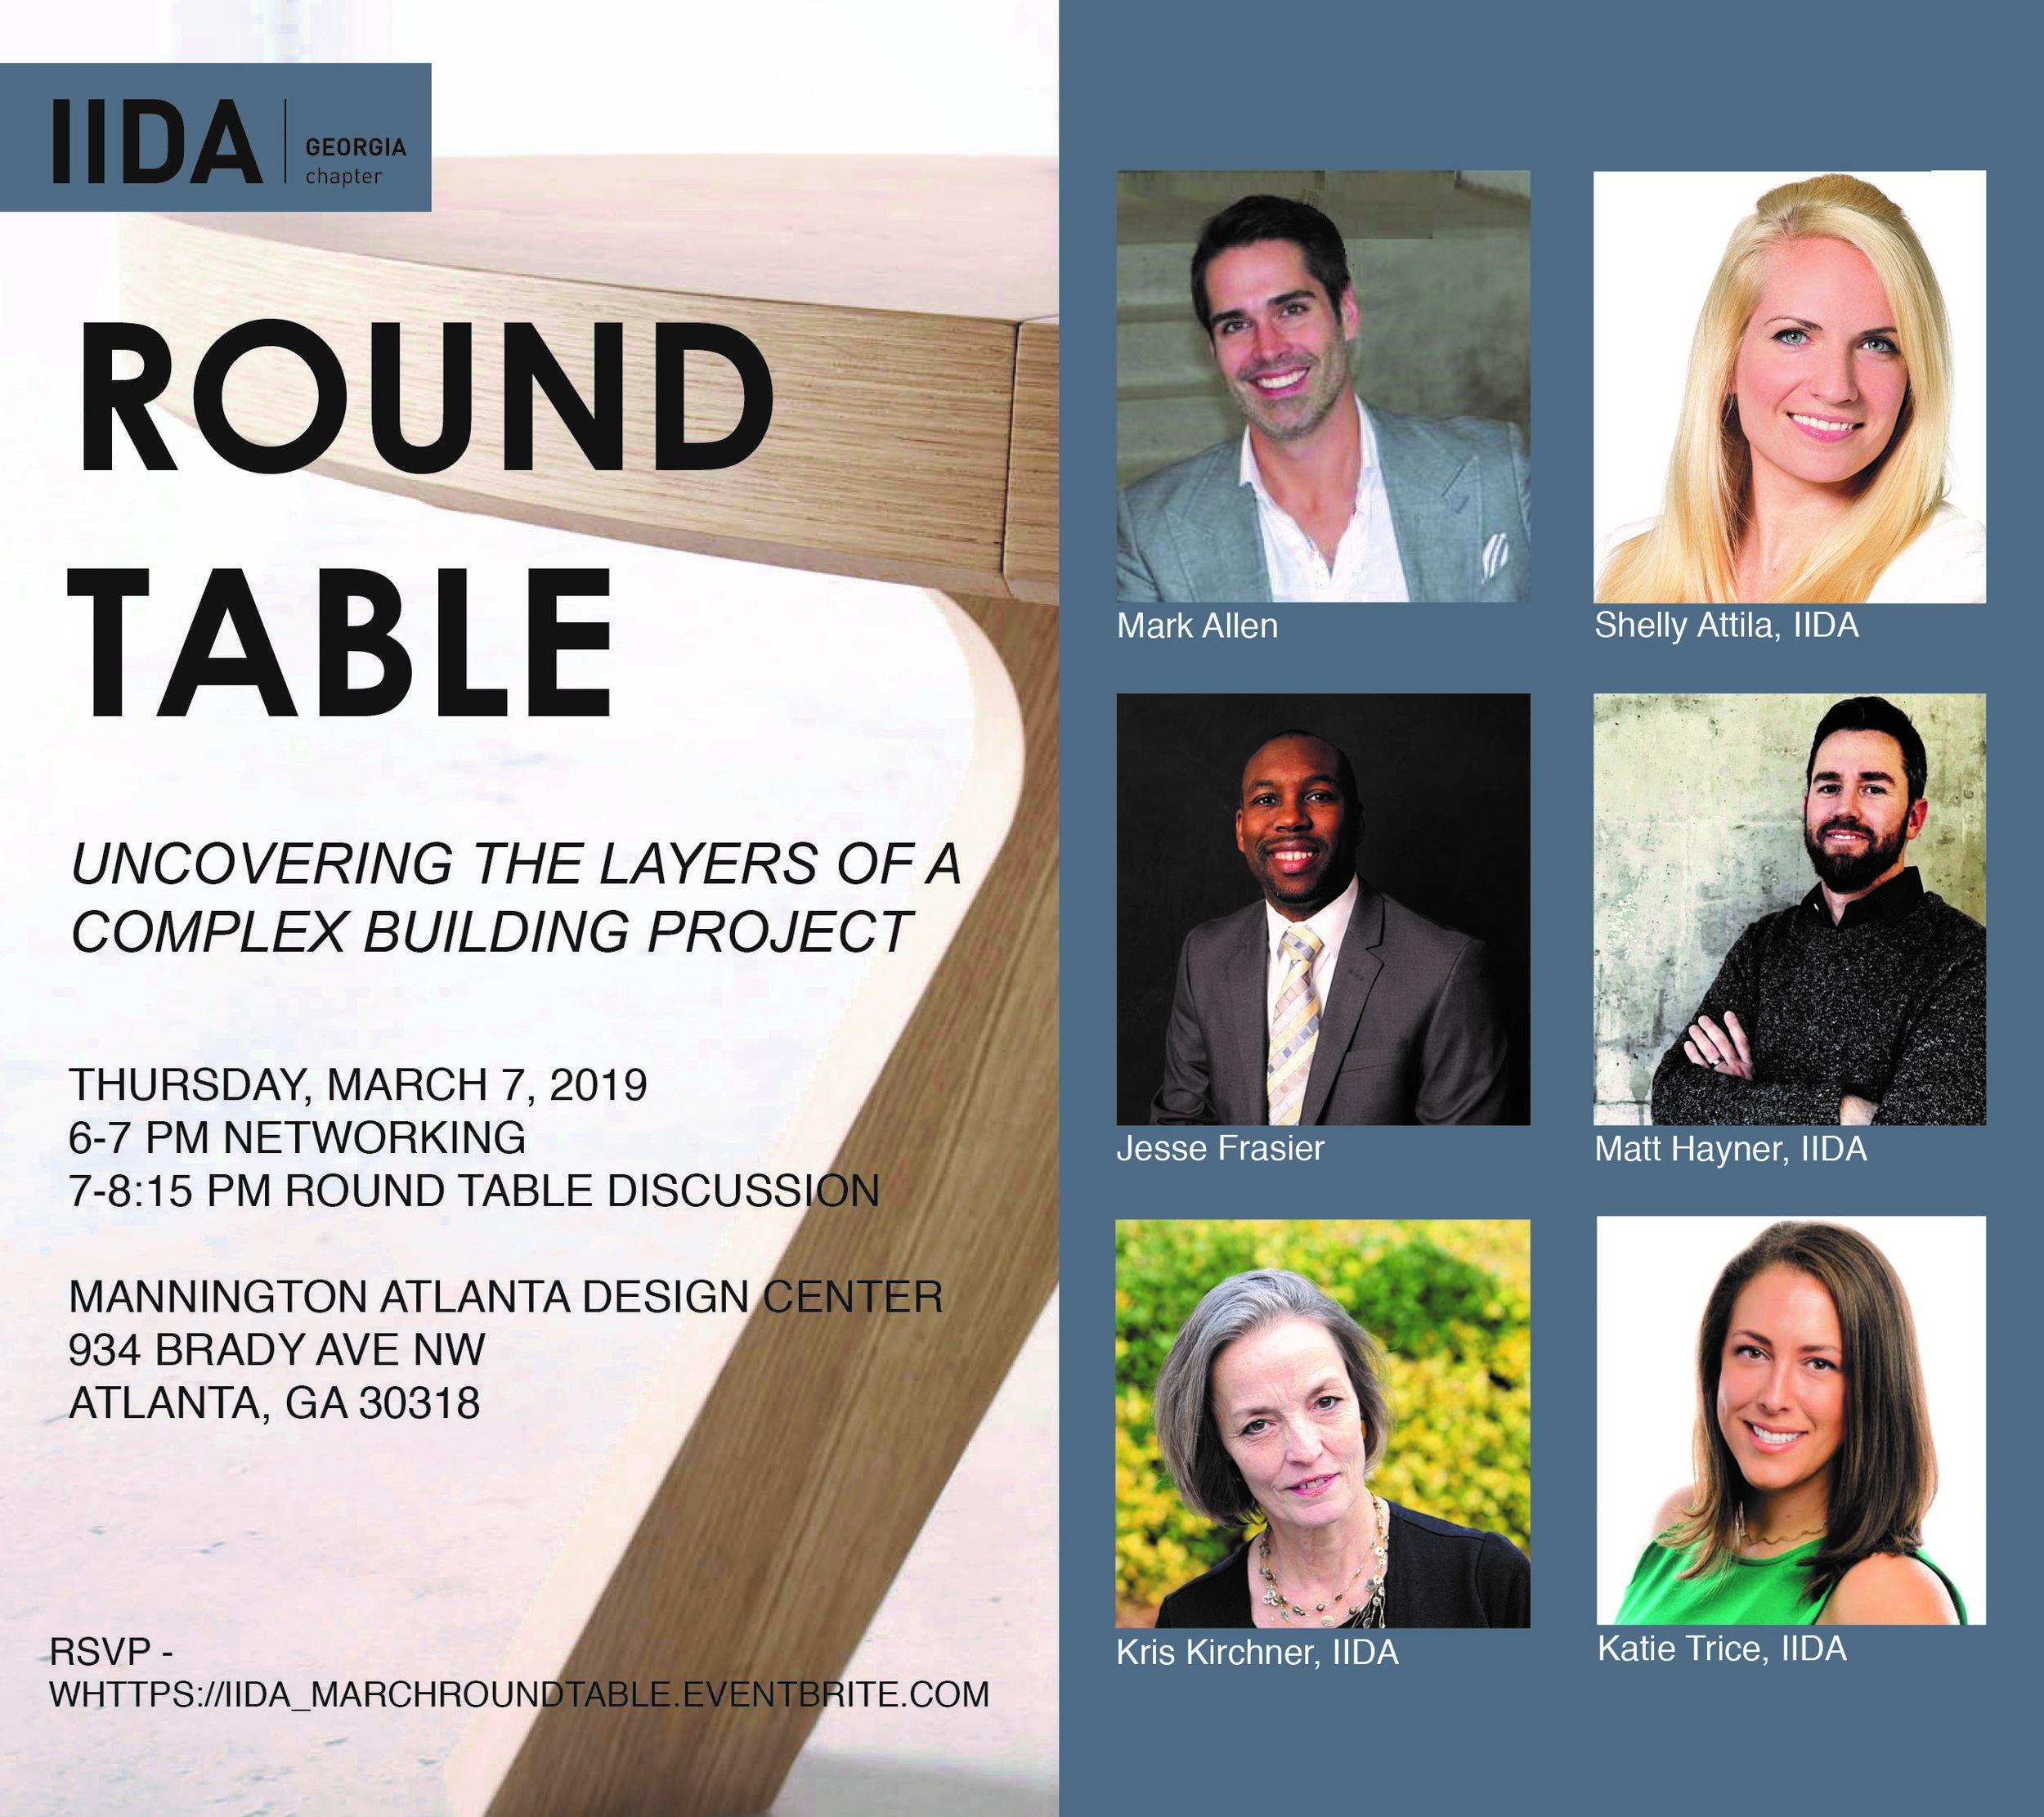 Round Table2.jpg